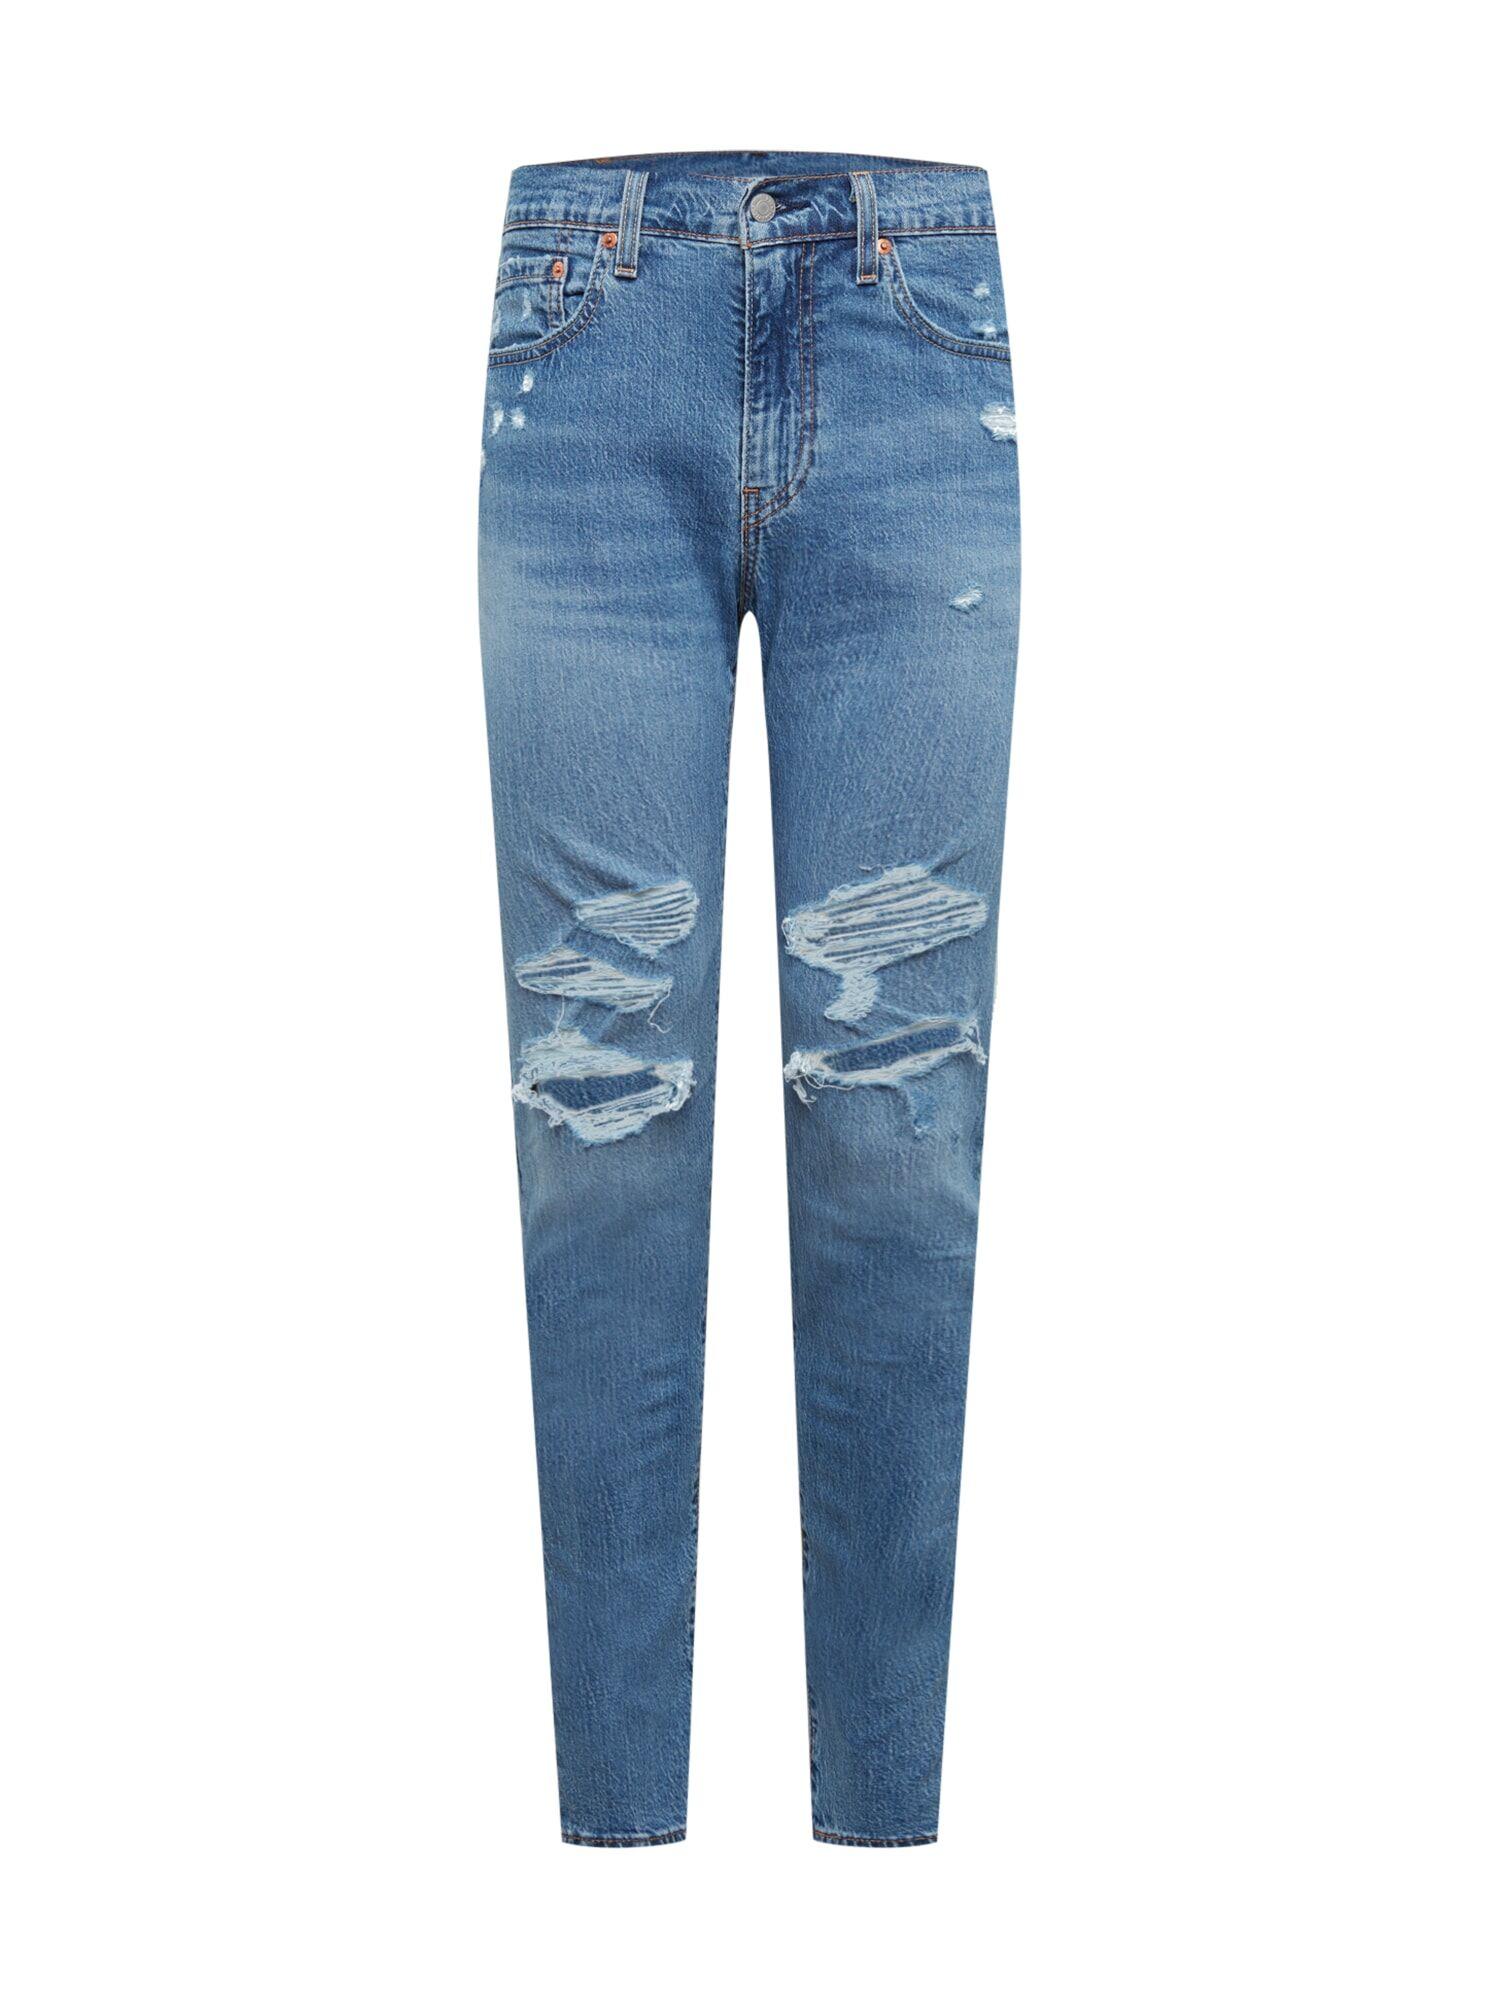 LEVI'S Jean '512'  - Bleu - Taille: 31 - male